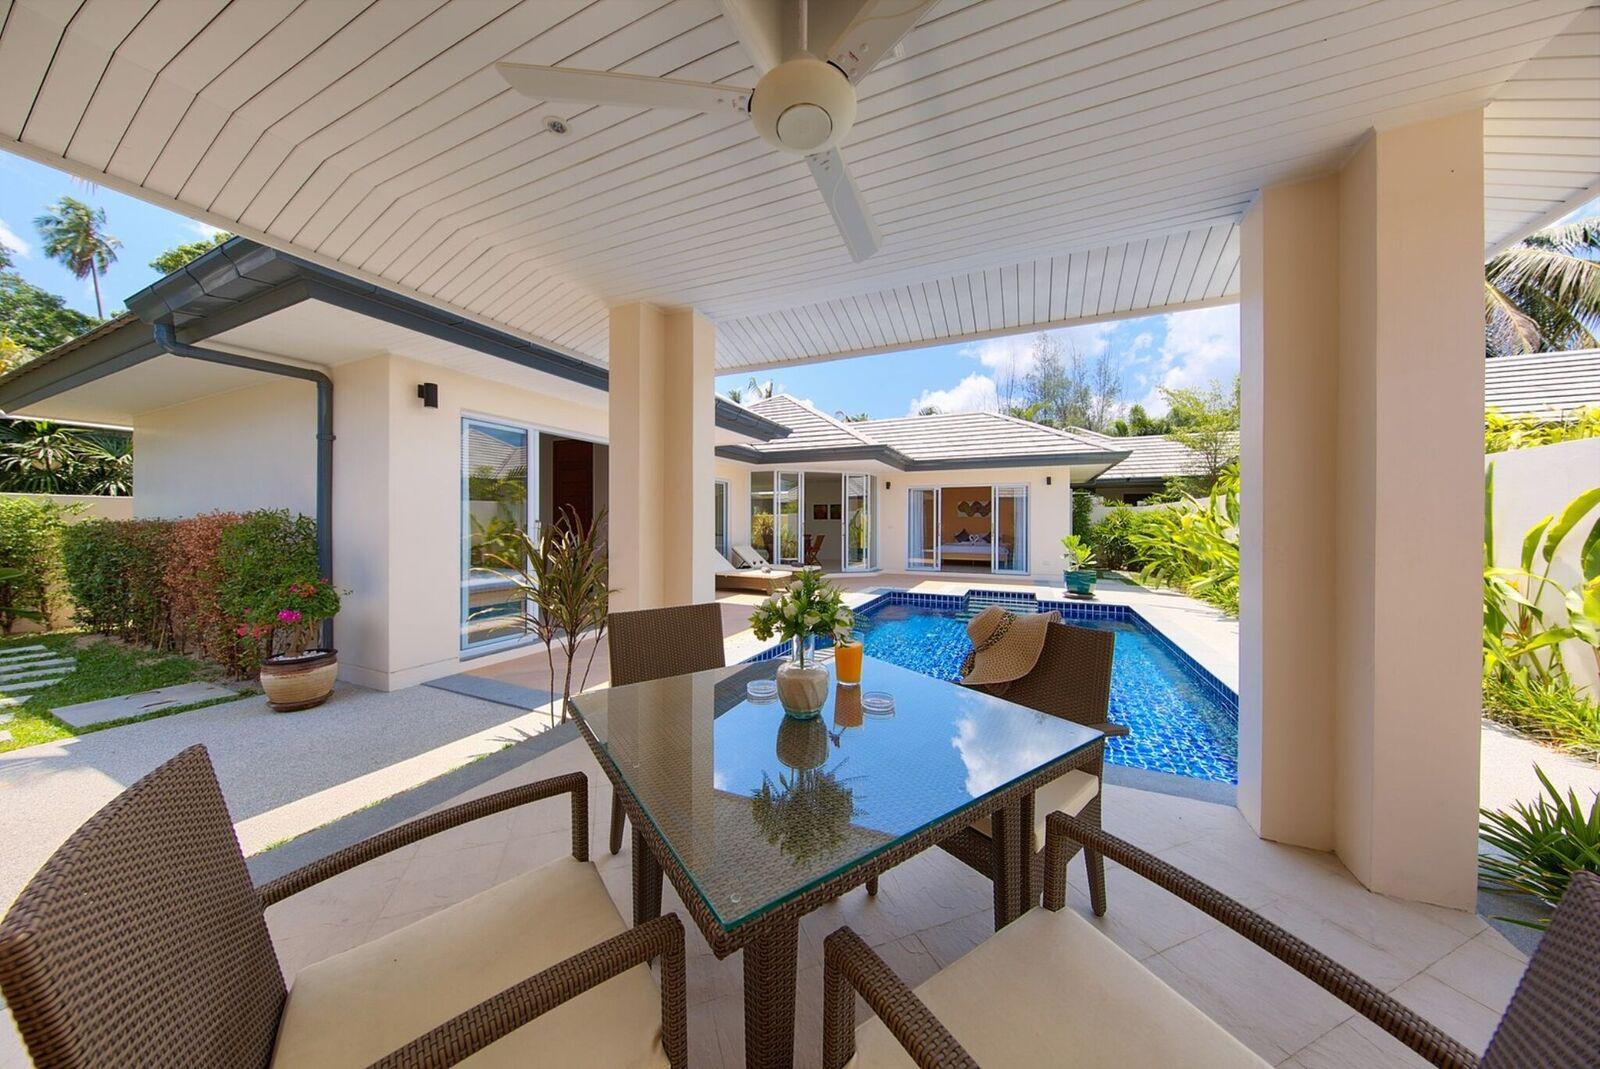 2 Bedroom Garden View Villa with Private Pool at Lipa Noi Samui